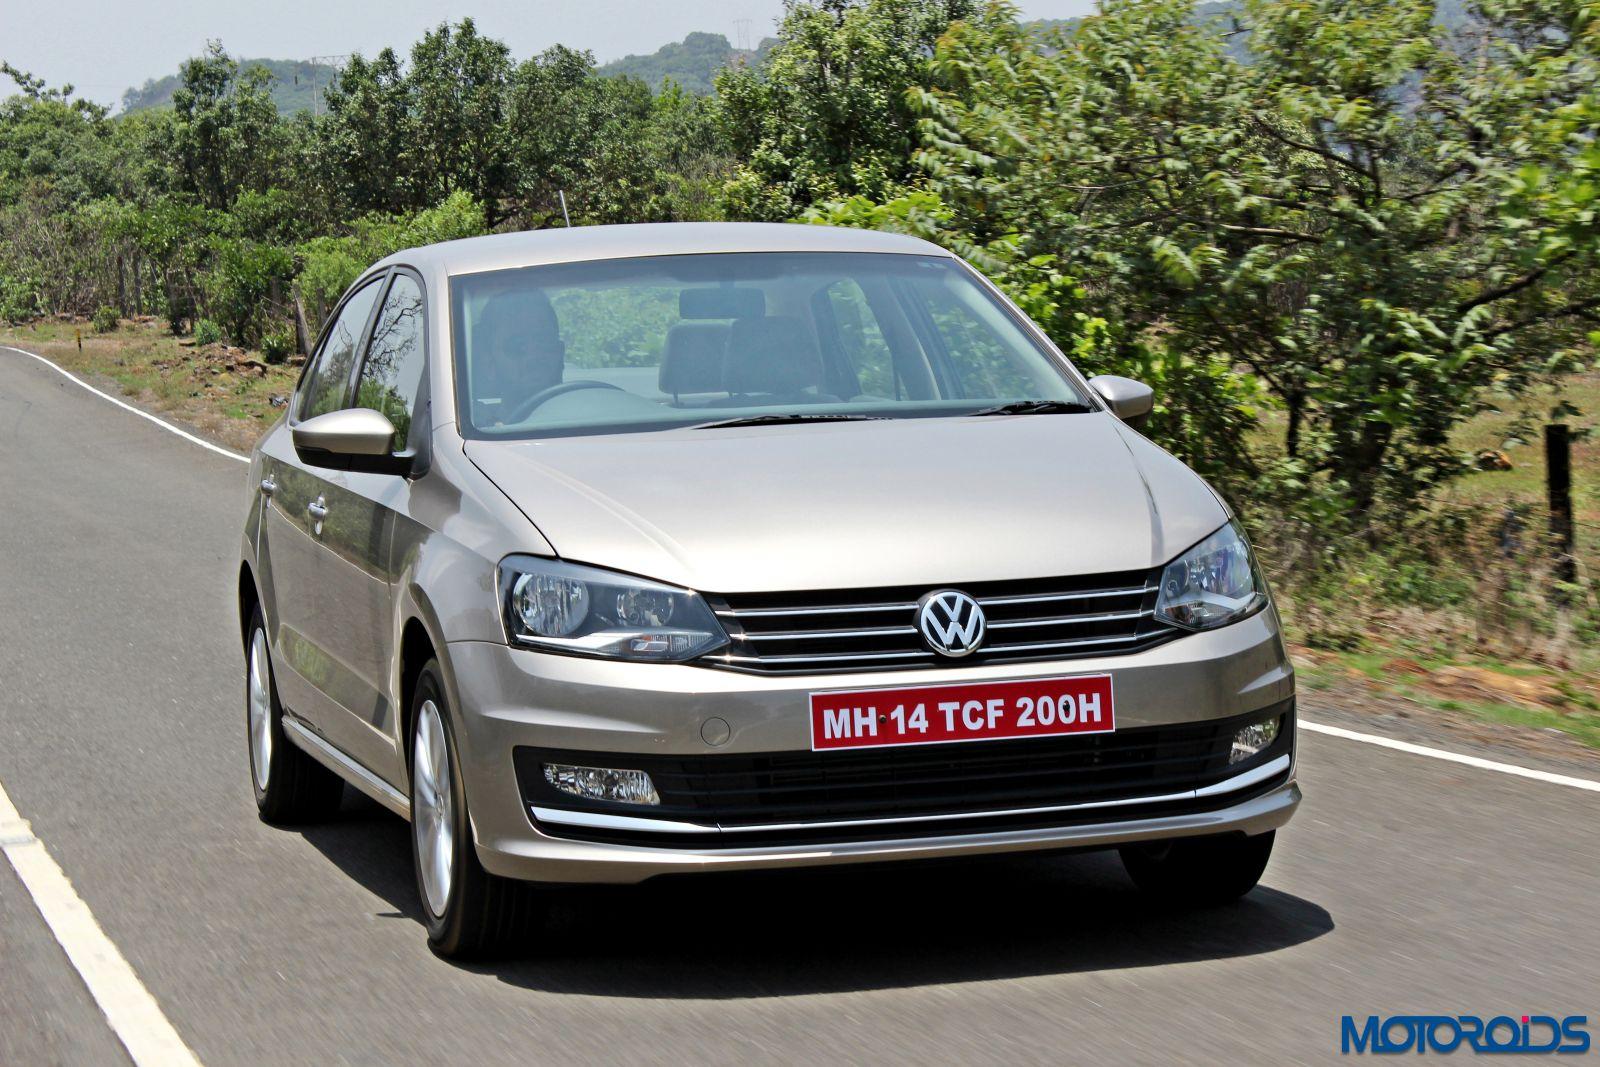 New 2015 Volkswagen Vento 1 5 Diesel Facelift Review Rehashed Refinement Motoroids